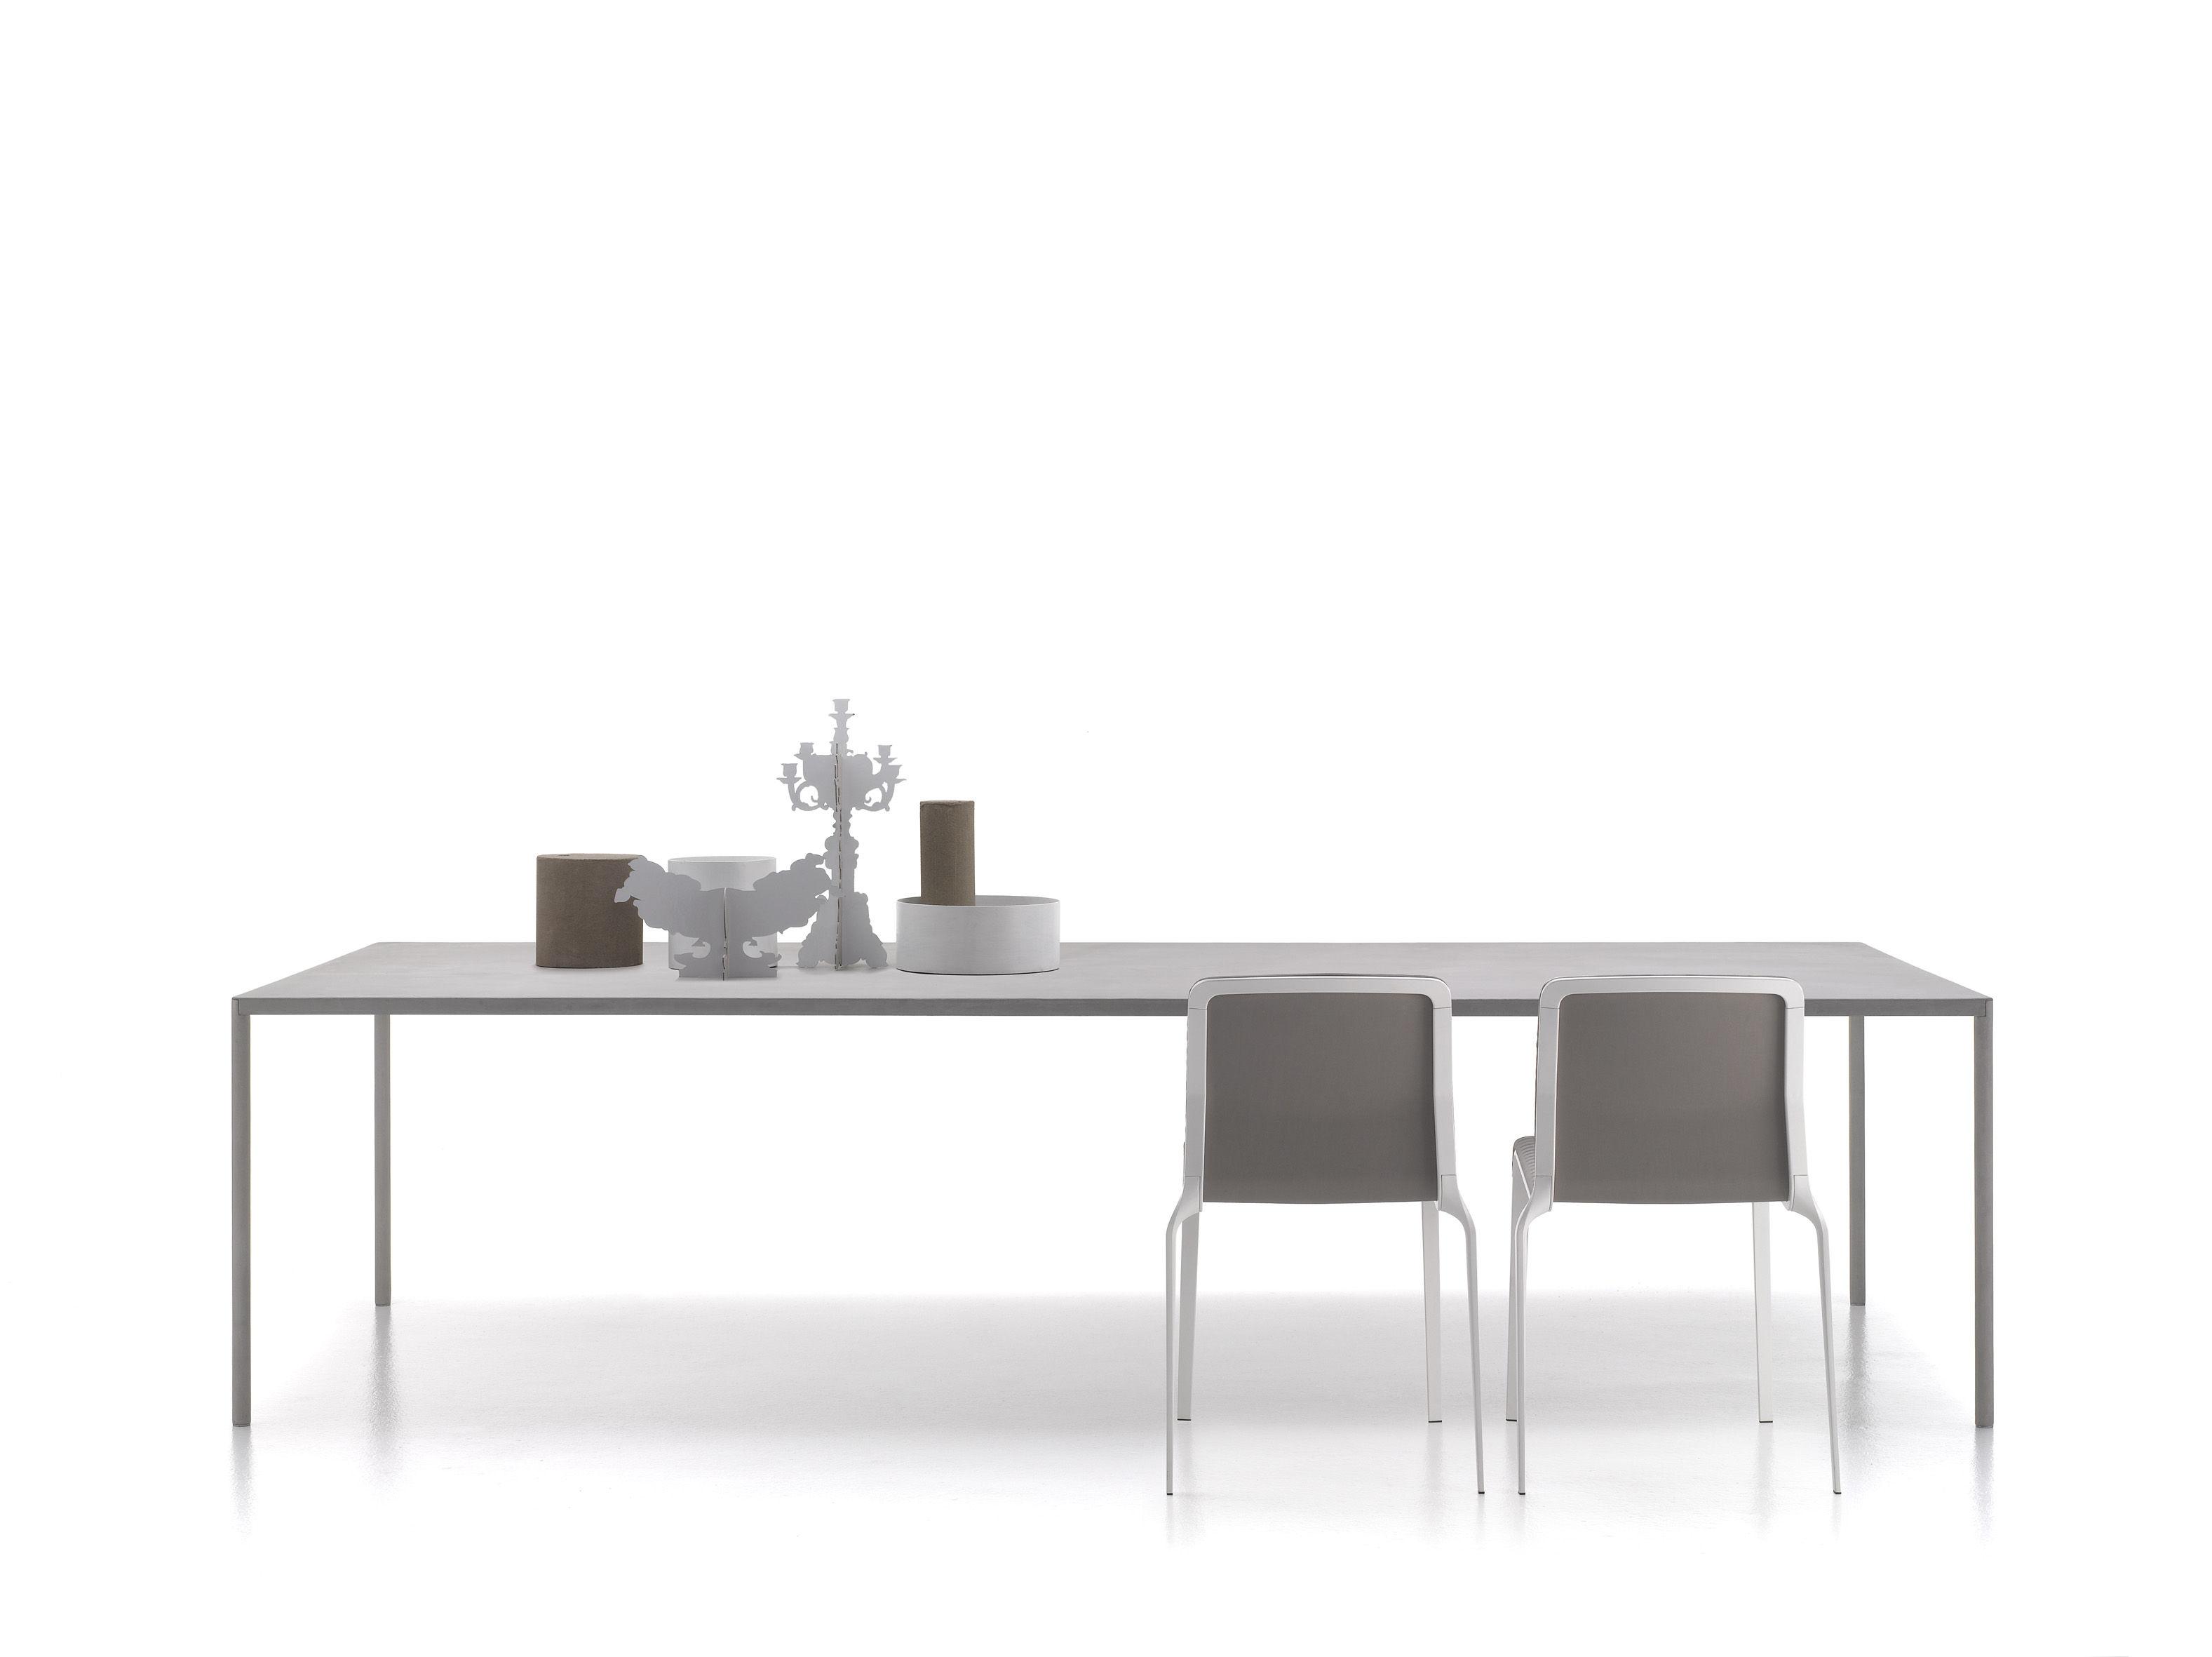 robin 100 x 220 cm mit beton mdf italia tisch. Black Bedroom Furniture Sets. Home Design Ideas